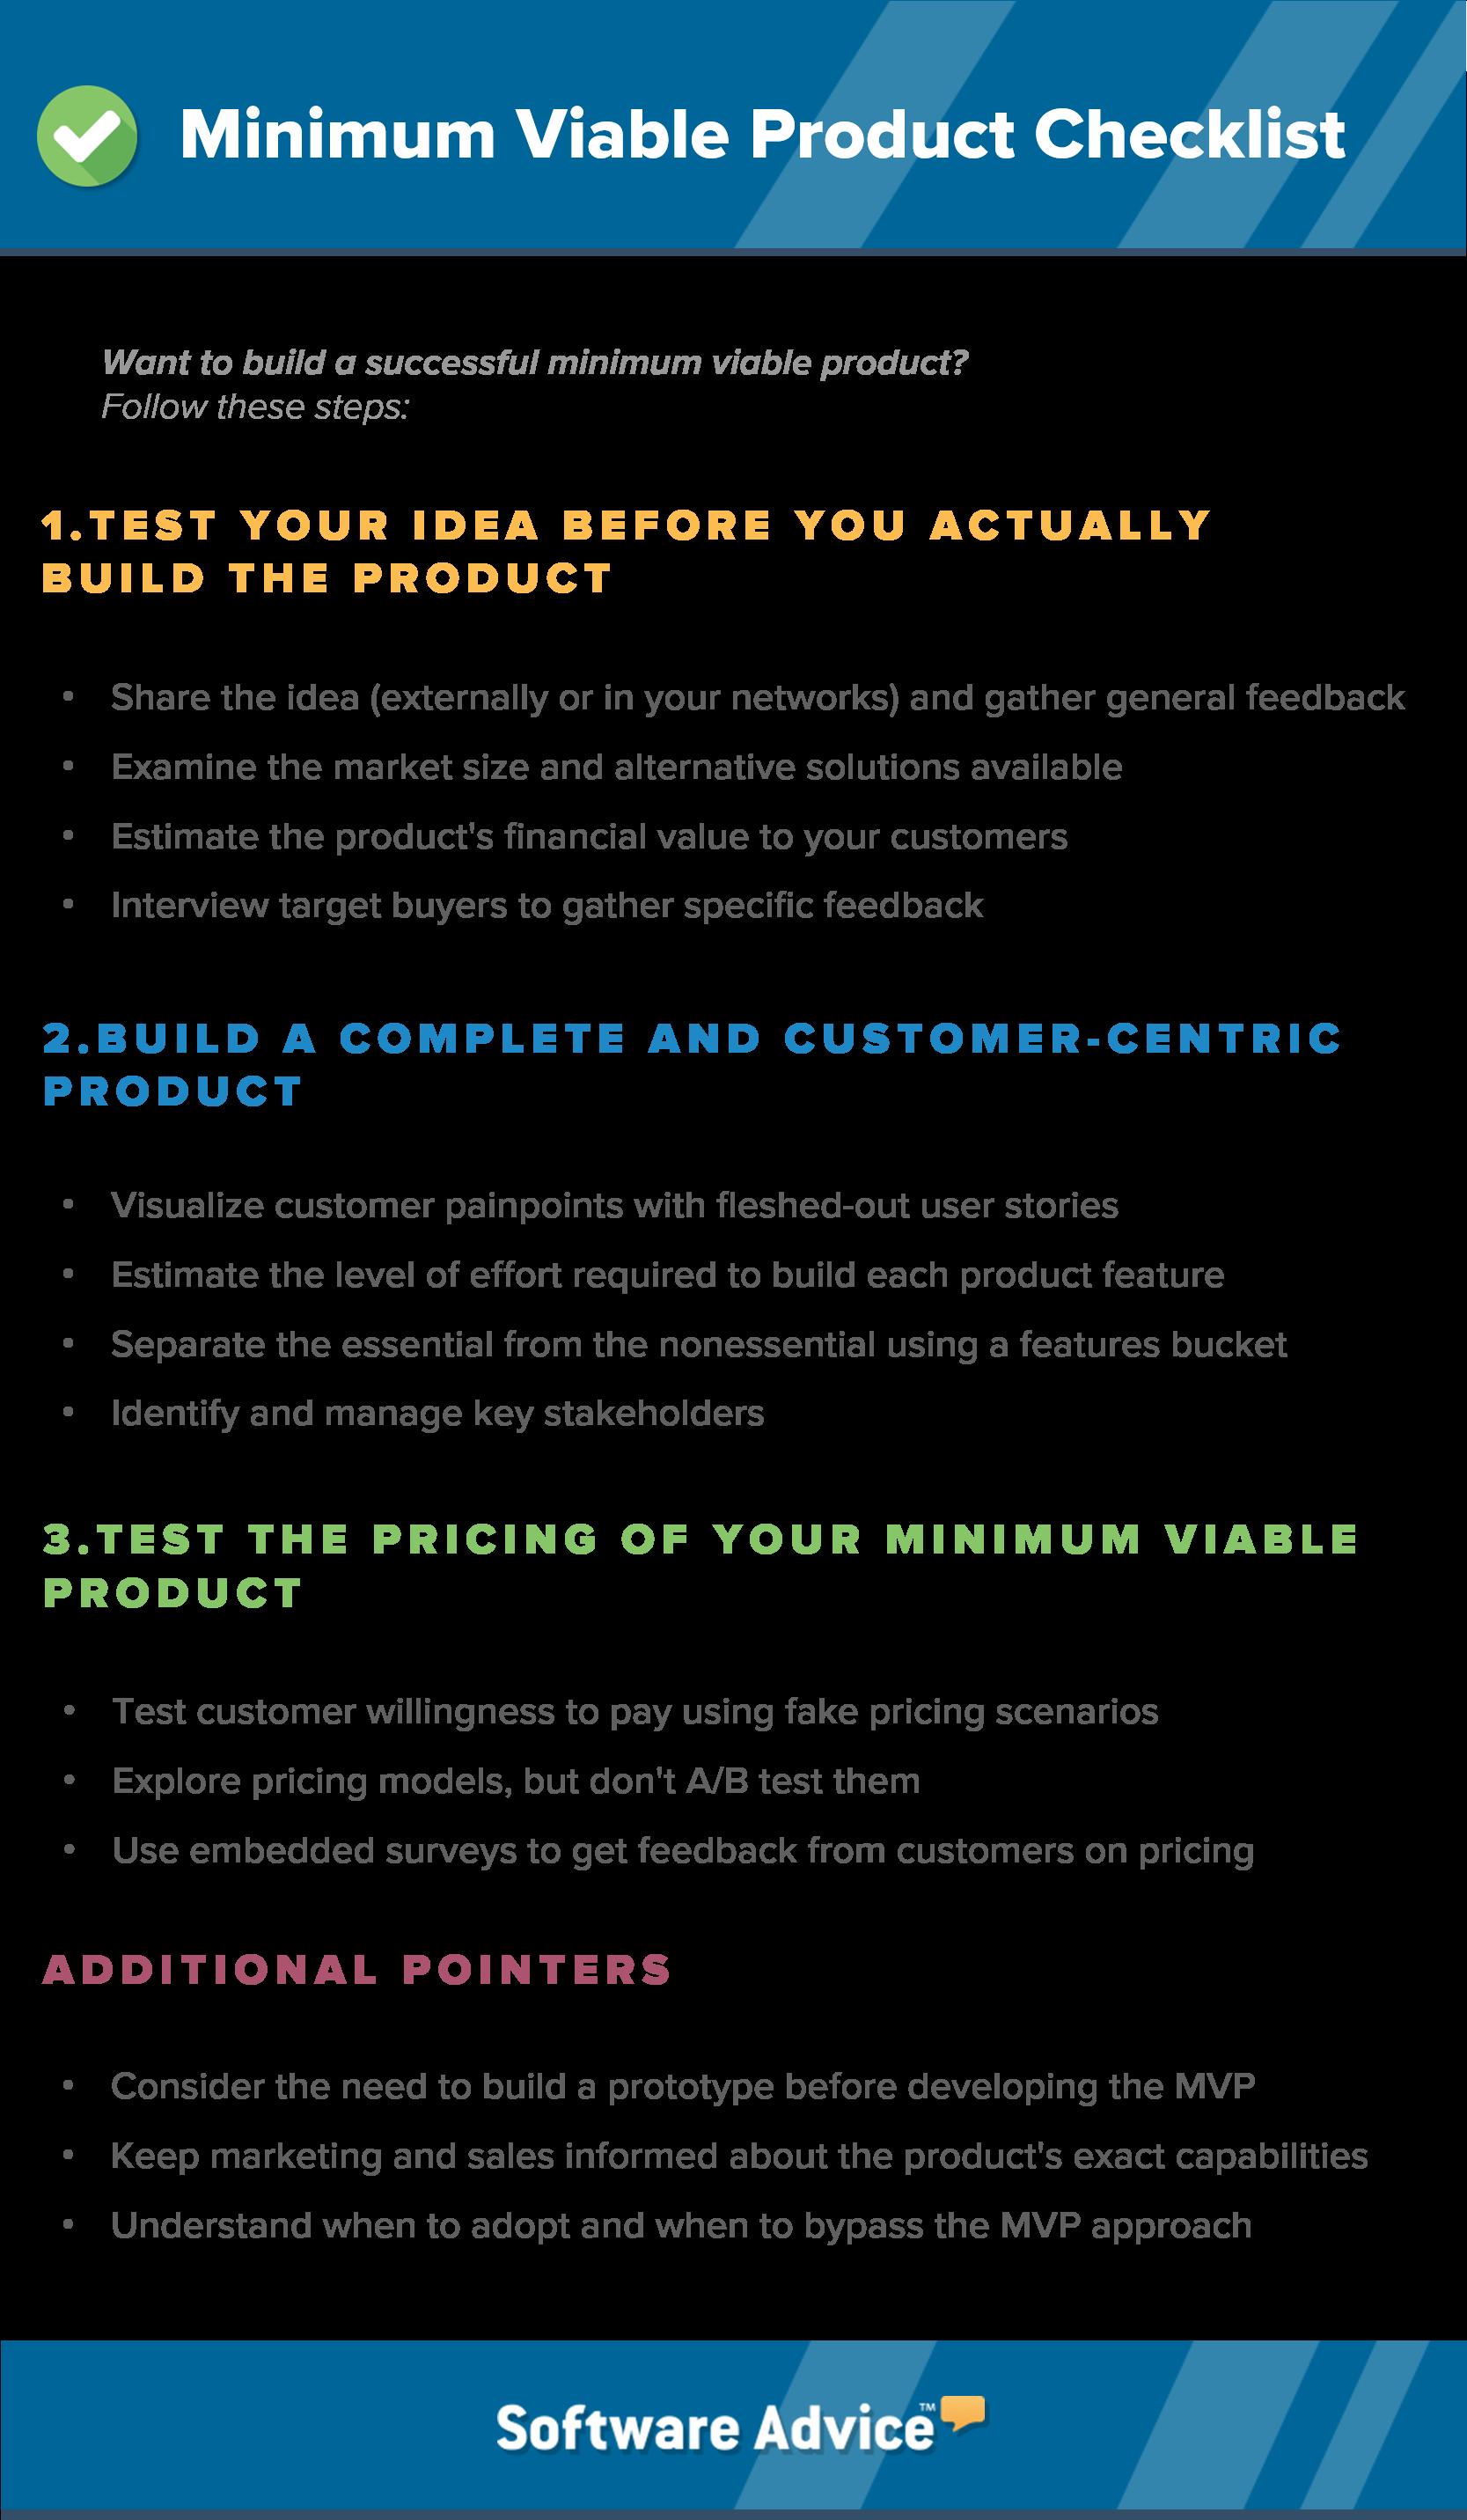 minimum viable product checklist